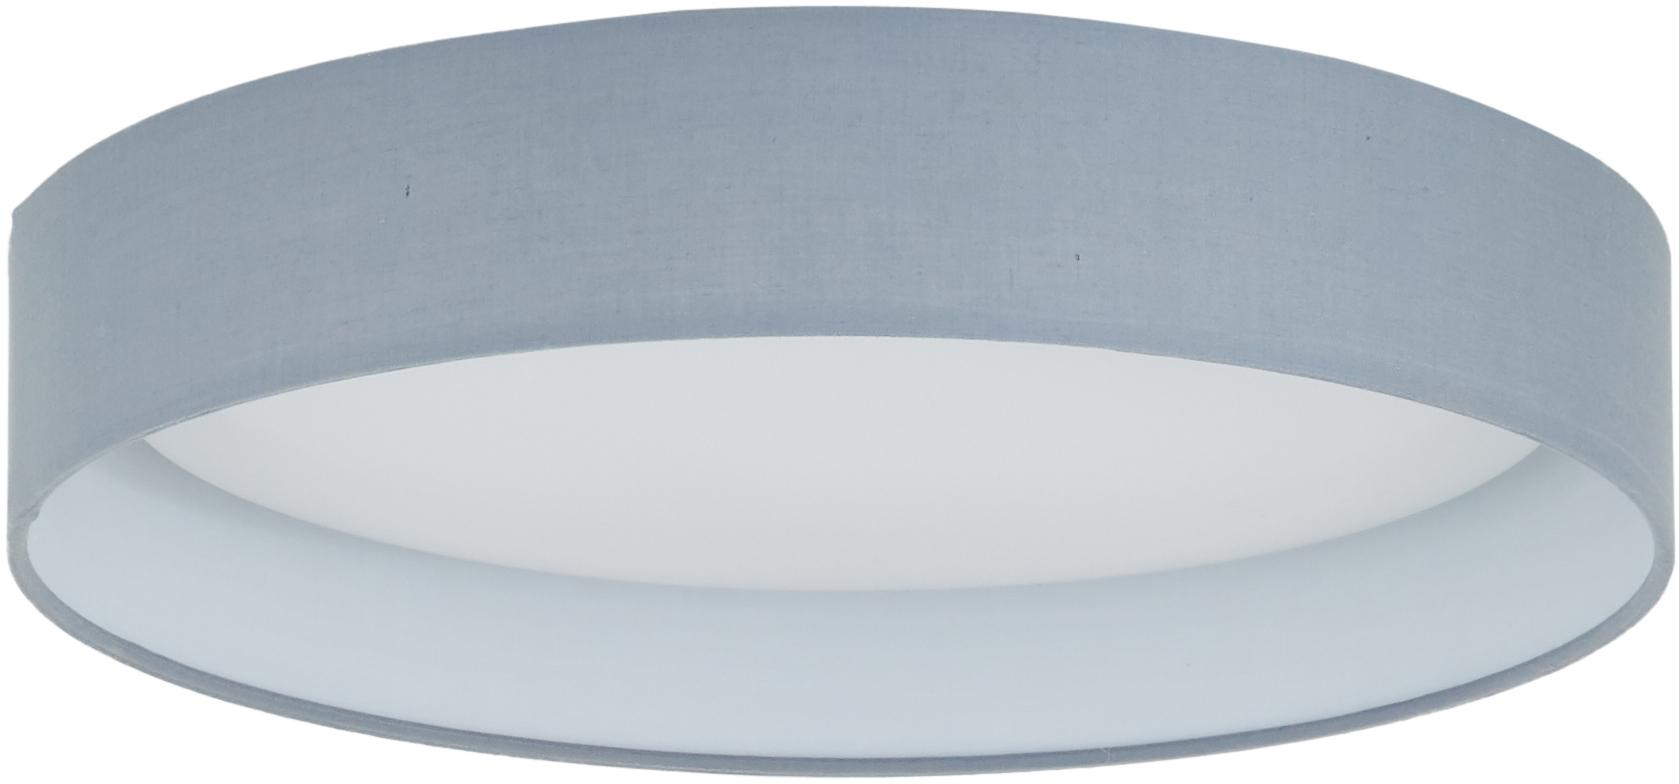 Plafoniera a LED Helen, Struttura: metallo, Grigio, Ø 35 x Alt. 7 cm